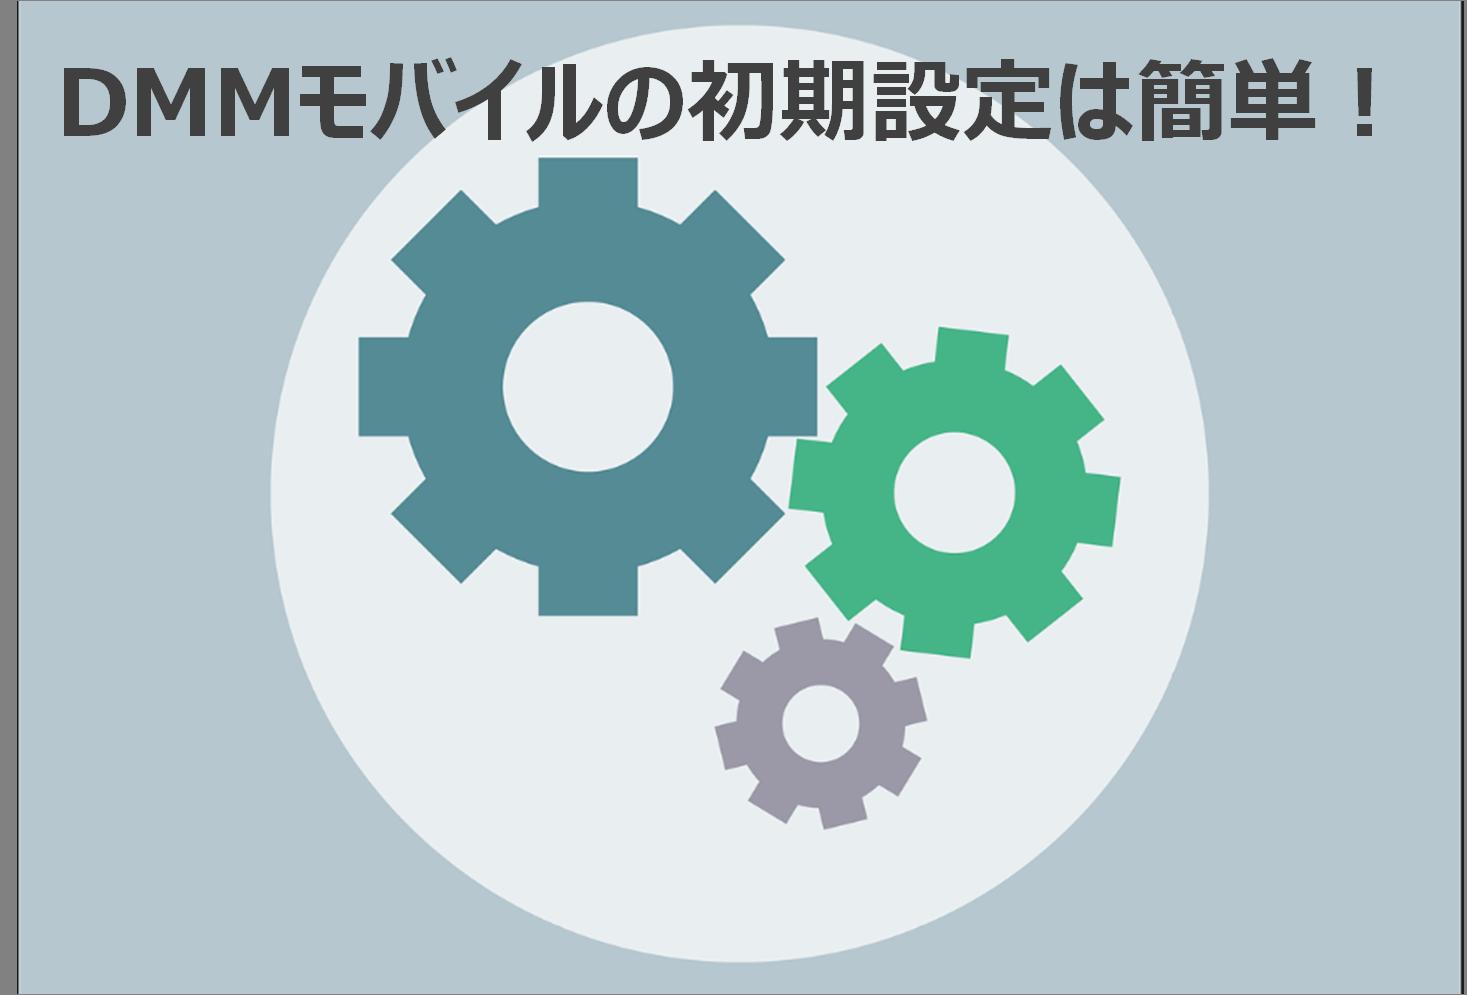 DMMモバイルの初期設定方法